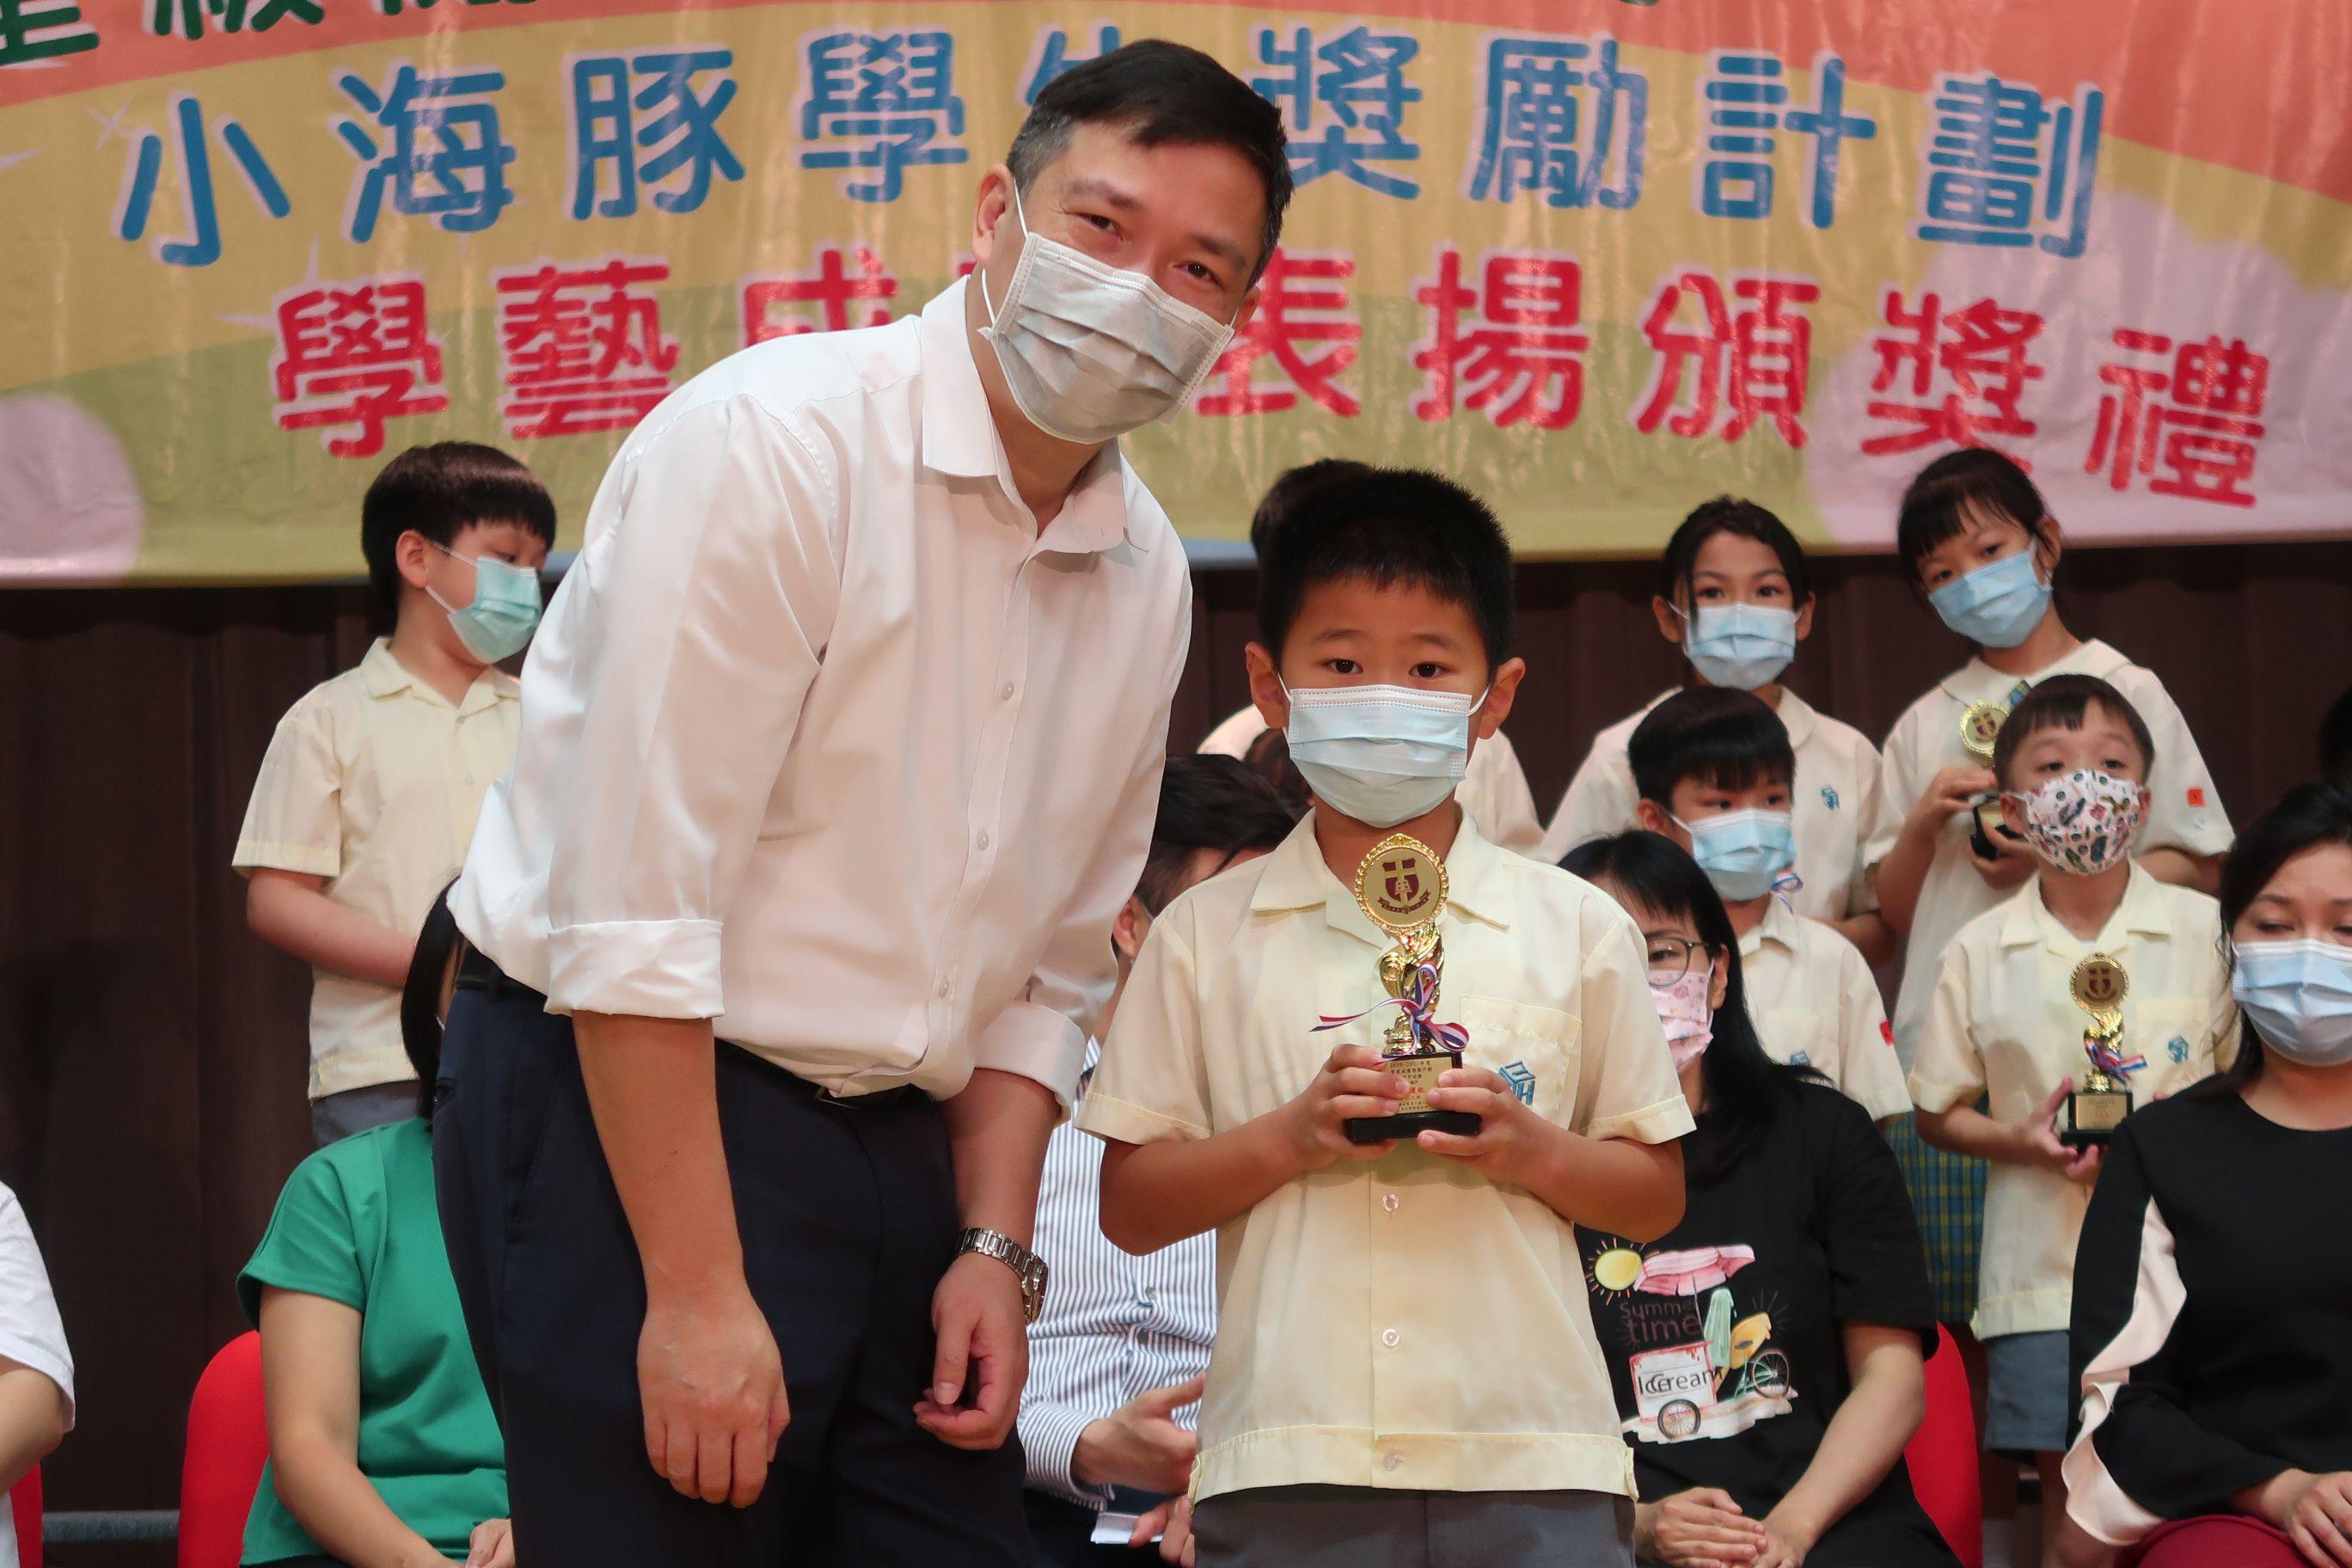 https://syh.edu.hk/sites/default/files/img_5668.jpg